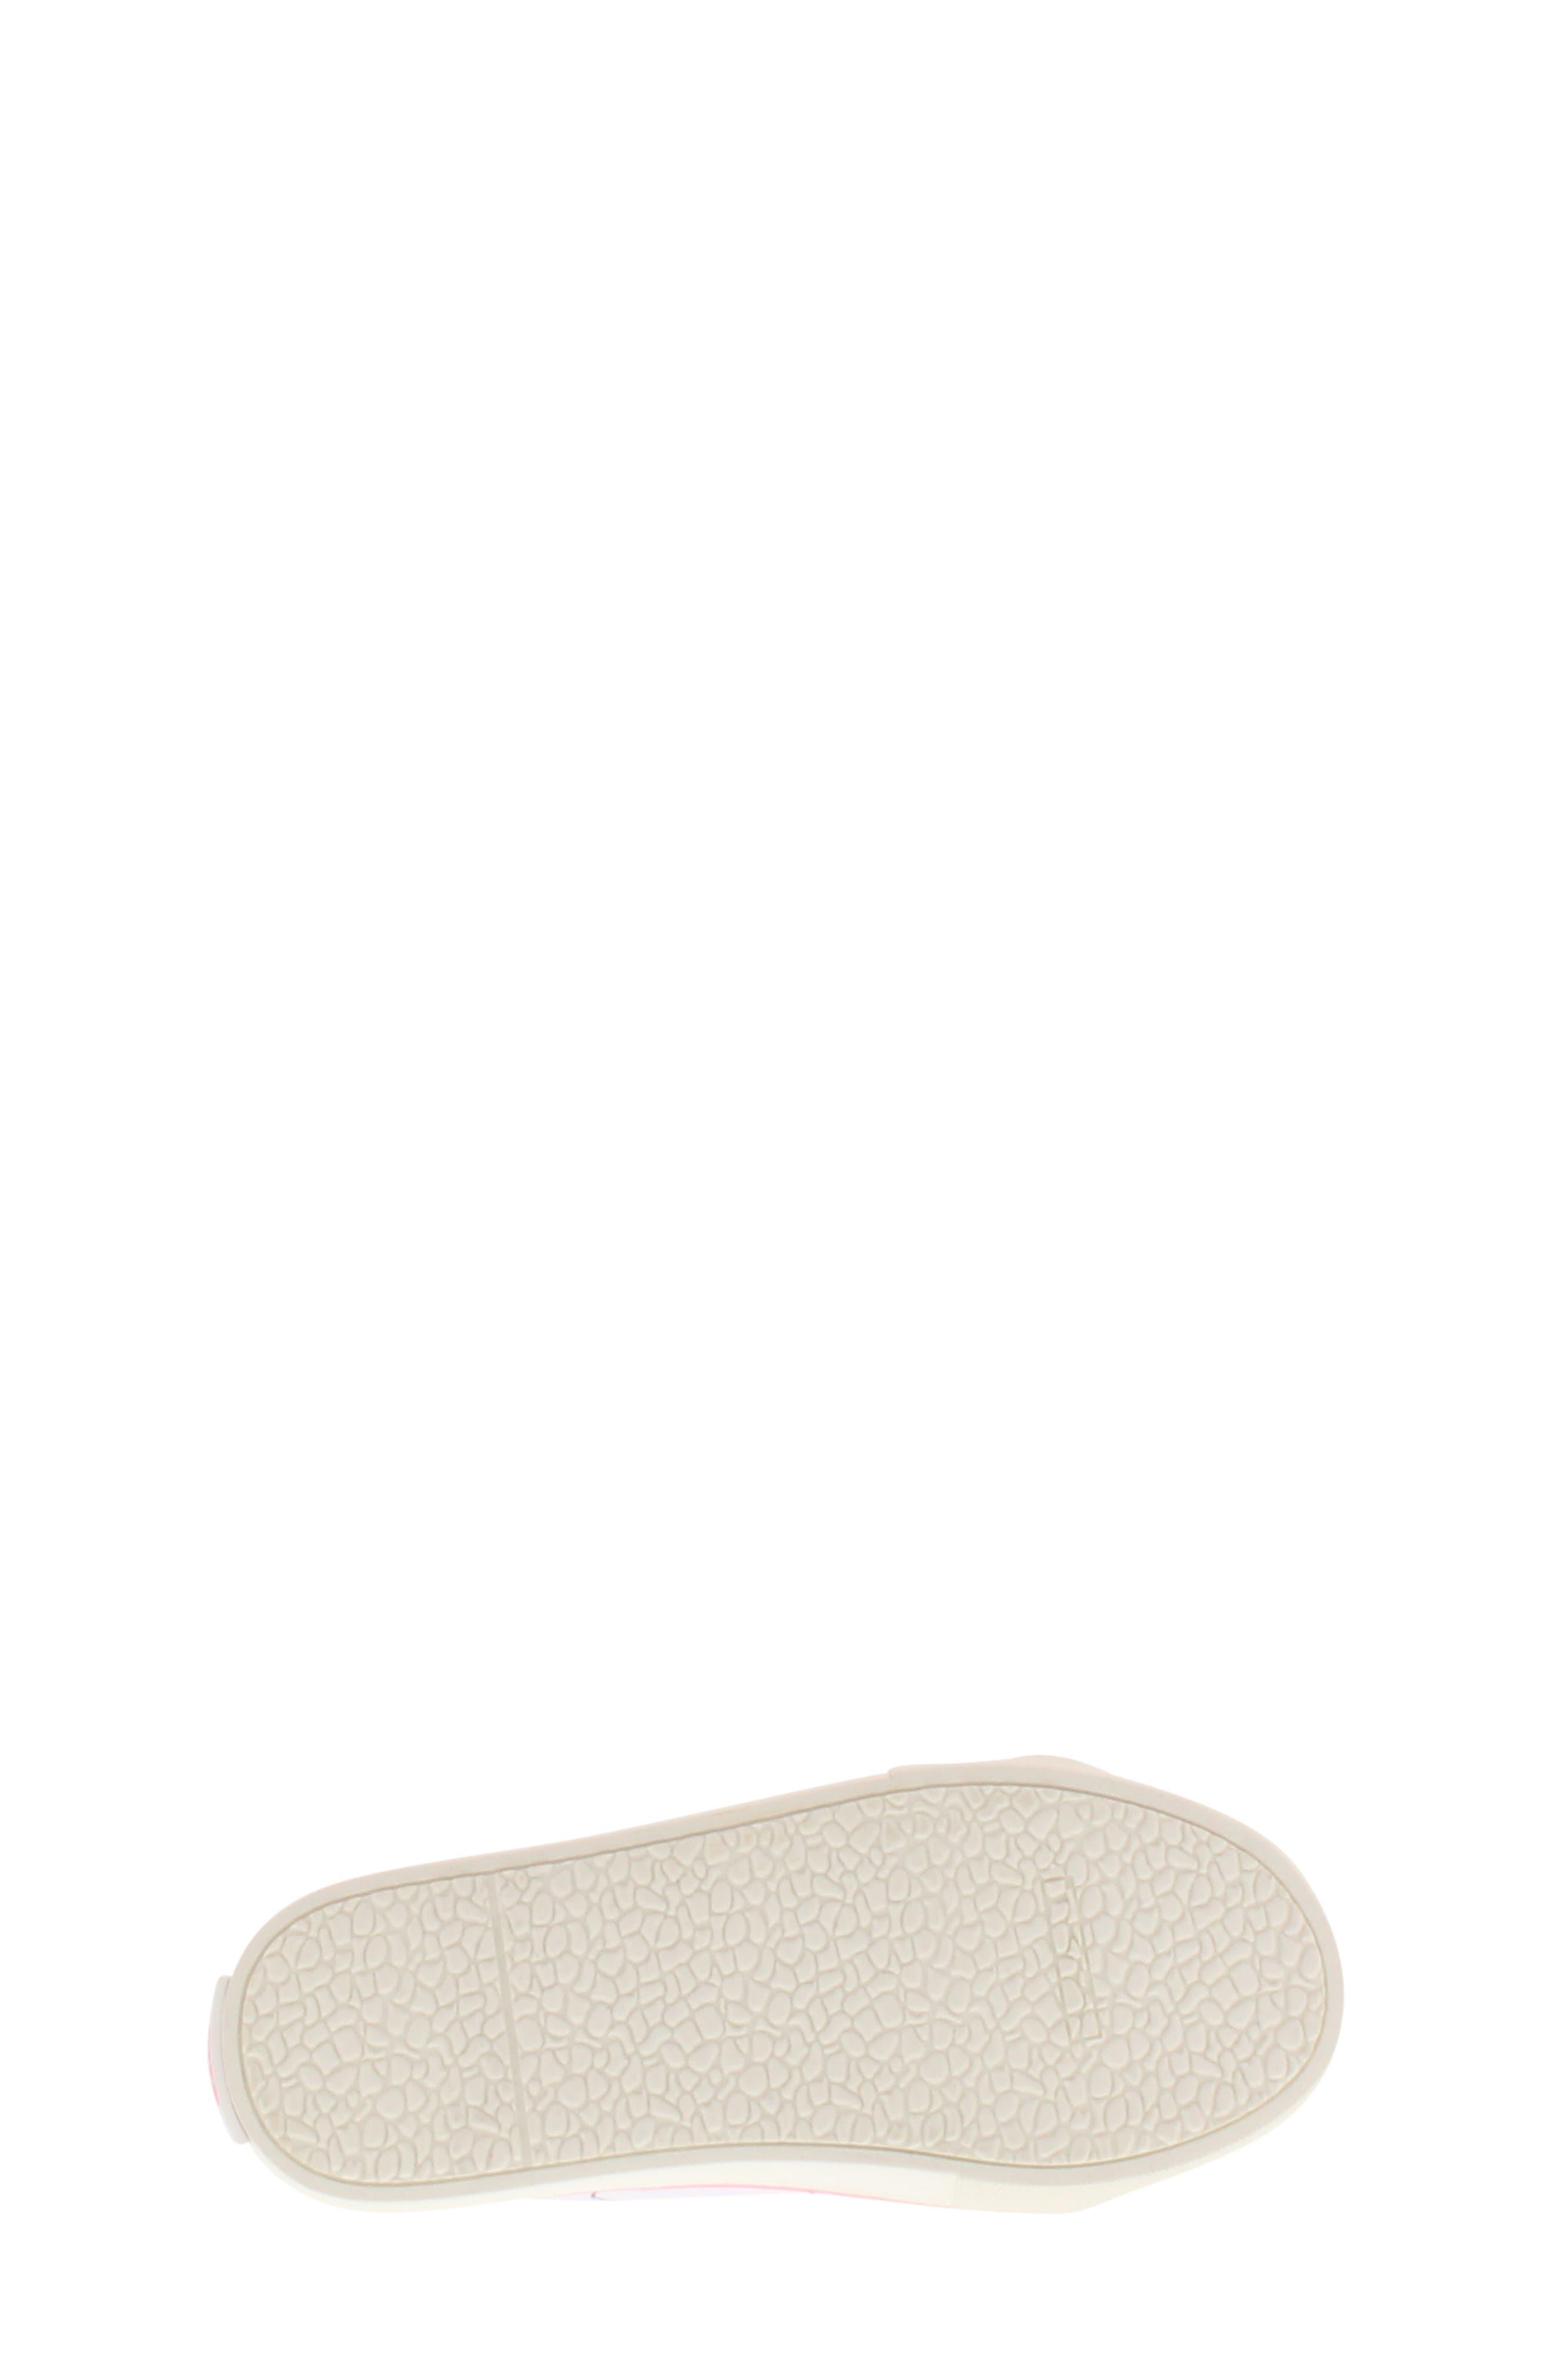 PAW PATROL, Skye Color DIY Sneaker, Alternate thumbnail 4, color, 685